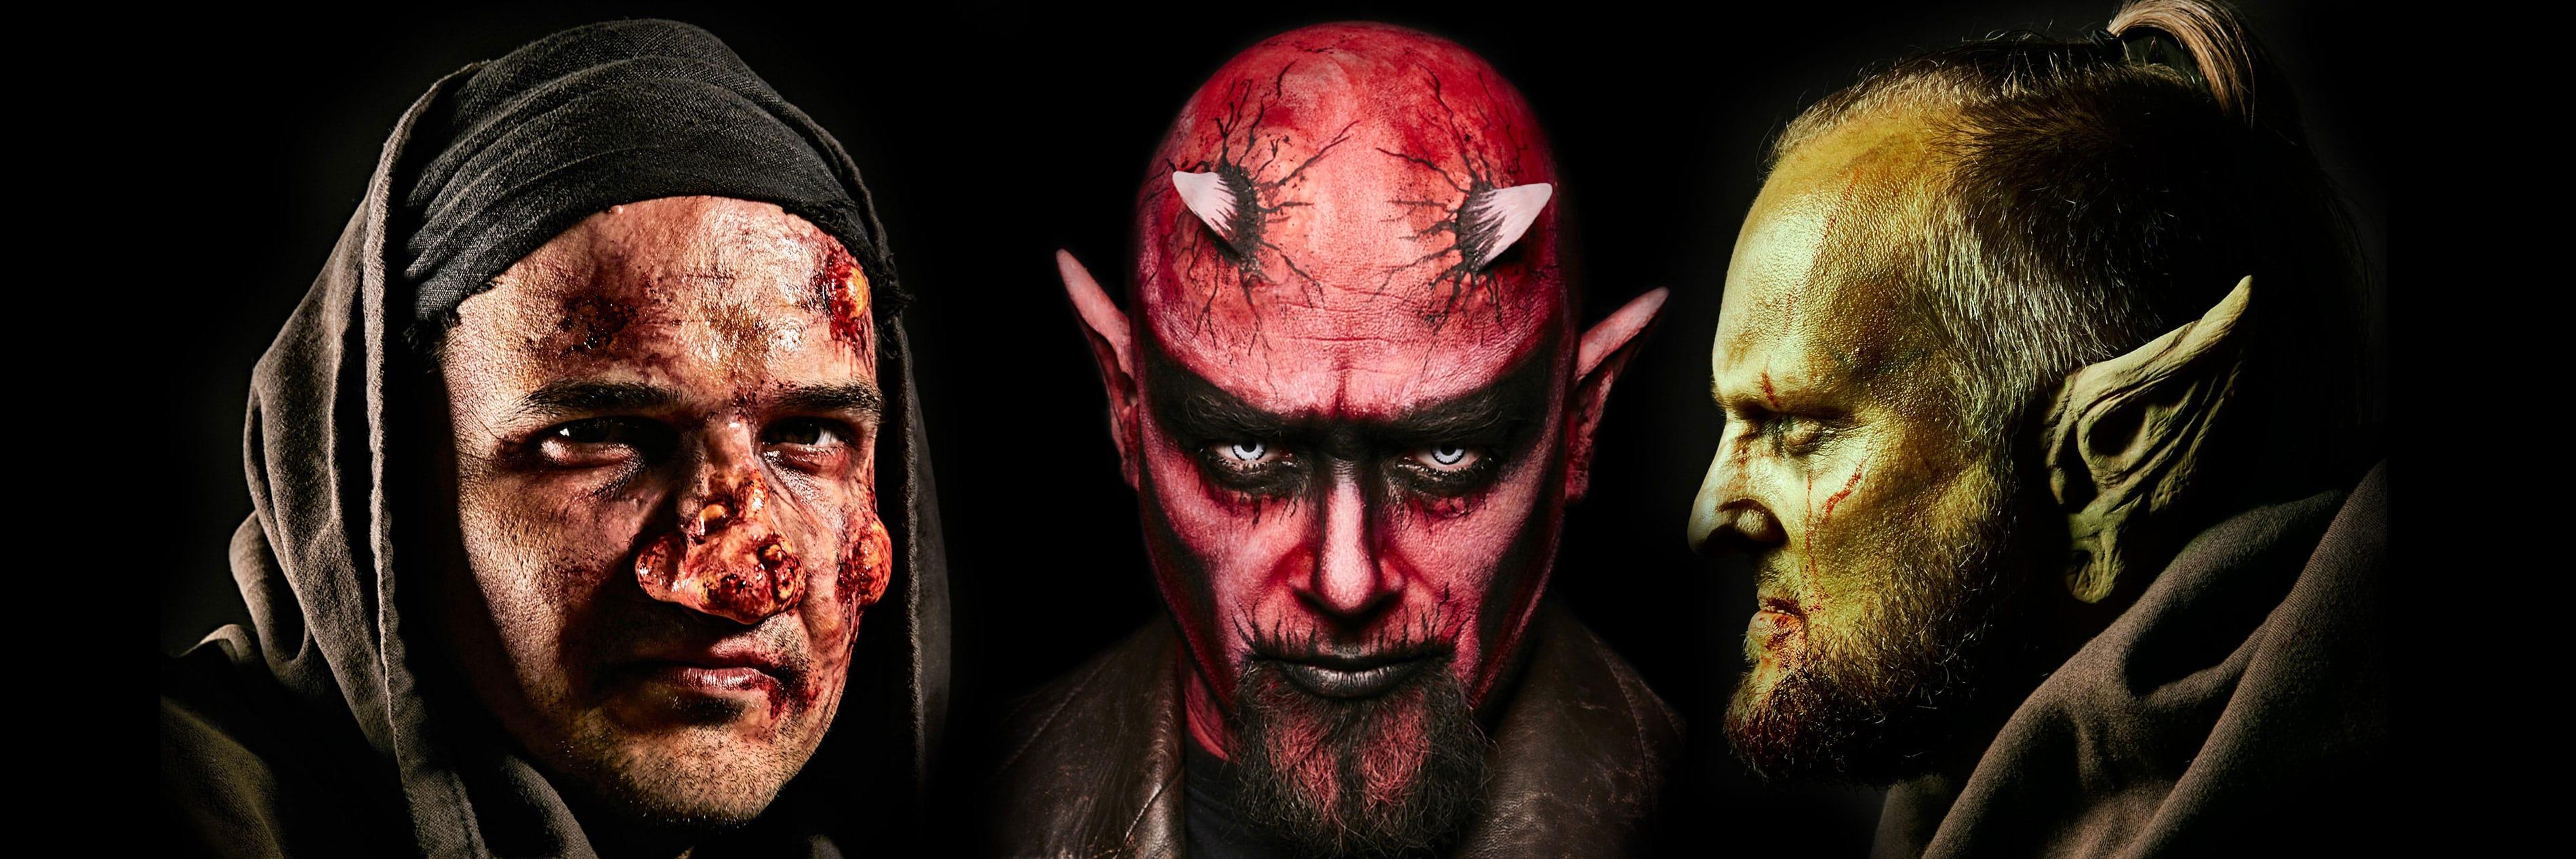 Kunstblut, Vampirzähne, Masken